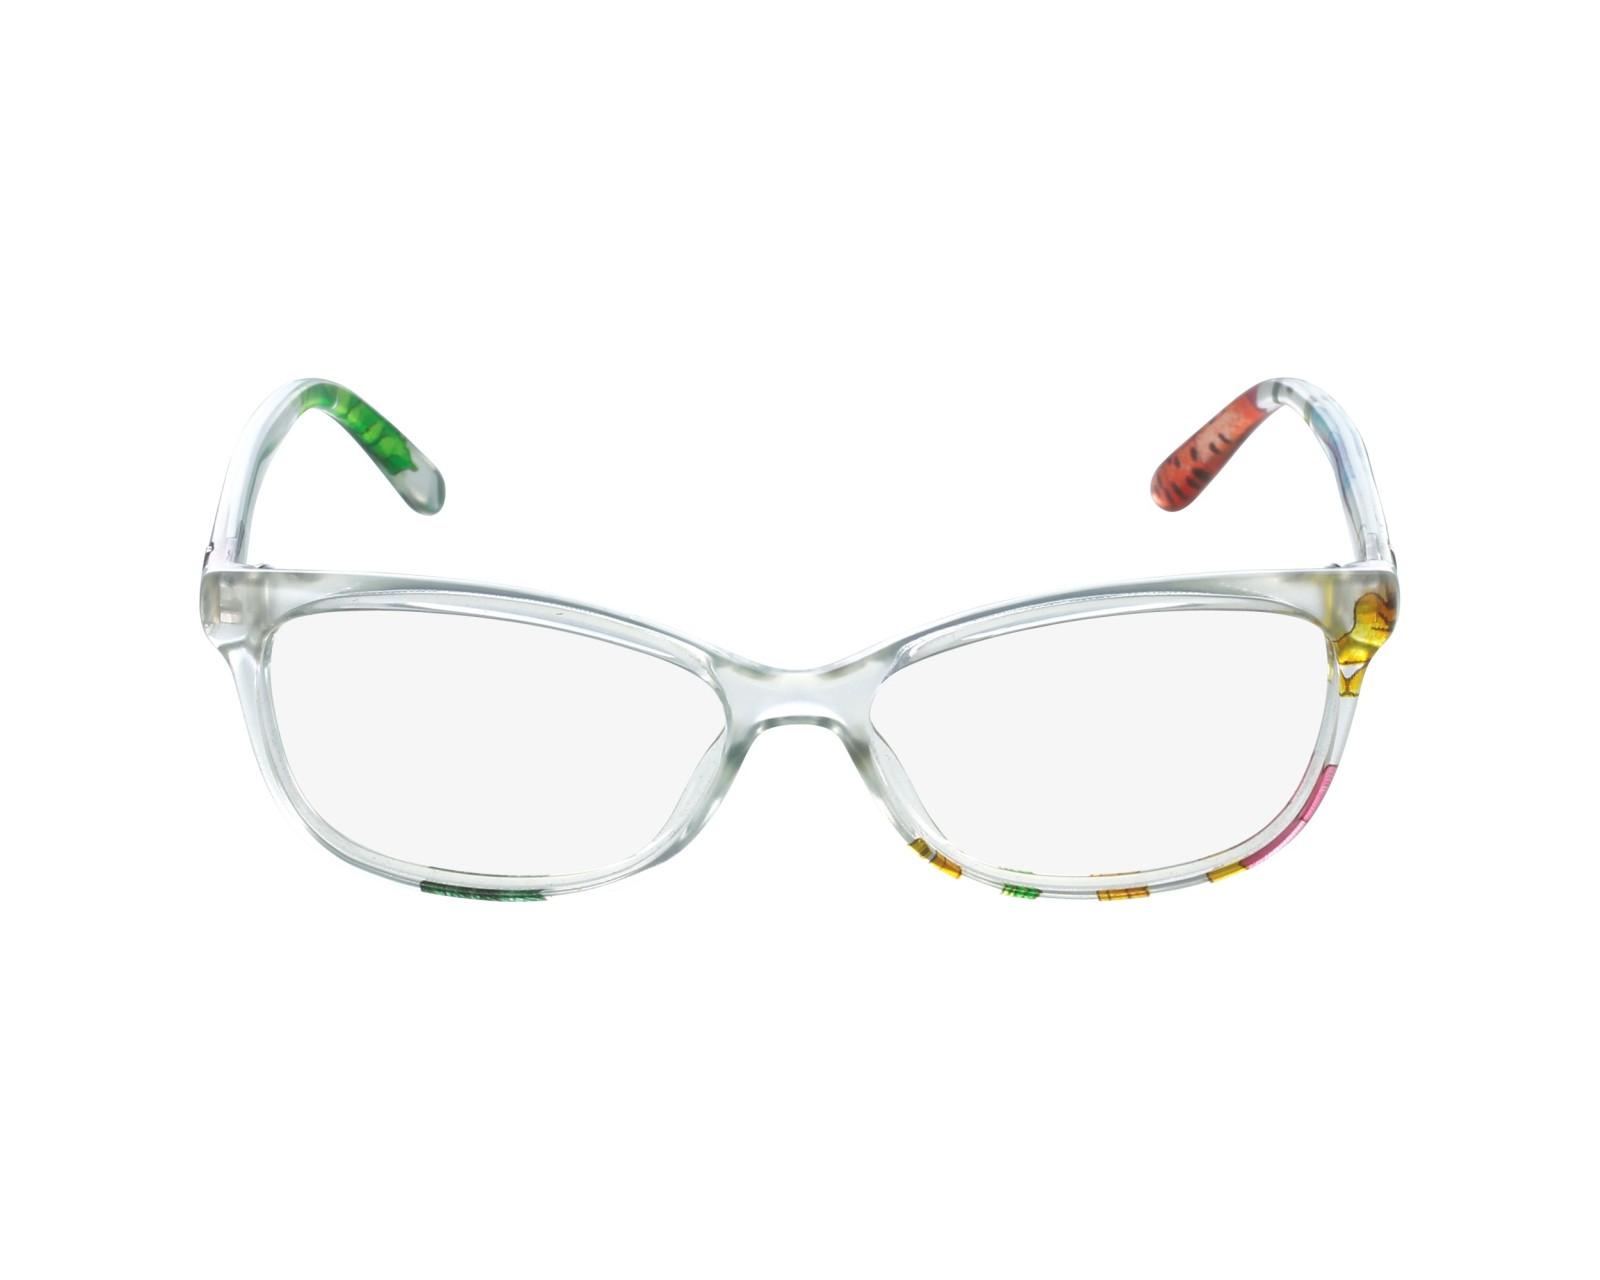 gucci 3699. eyeglasses gucci - gg 3699/n ze5 3699 p